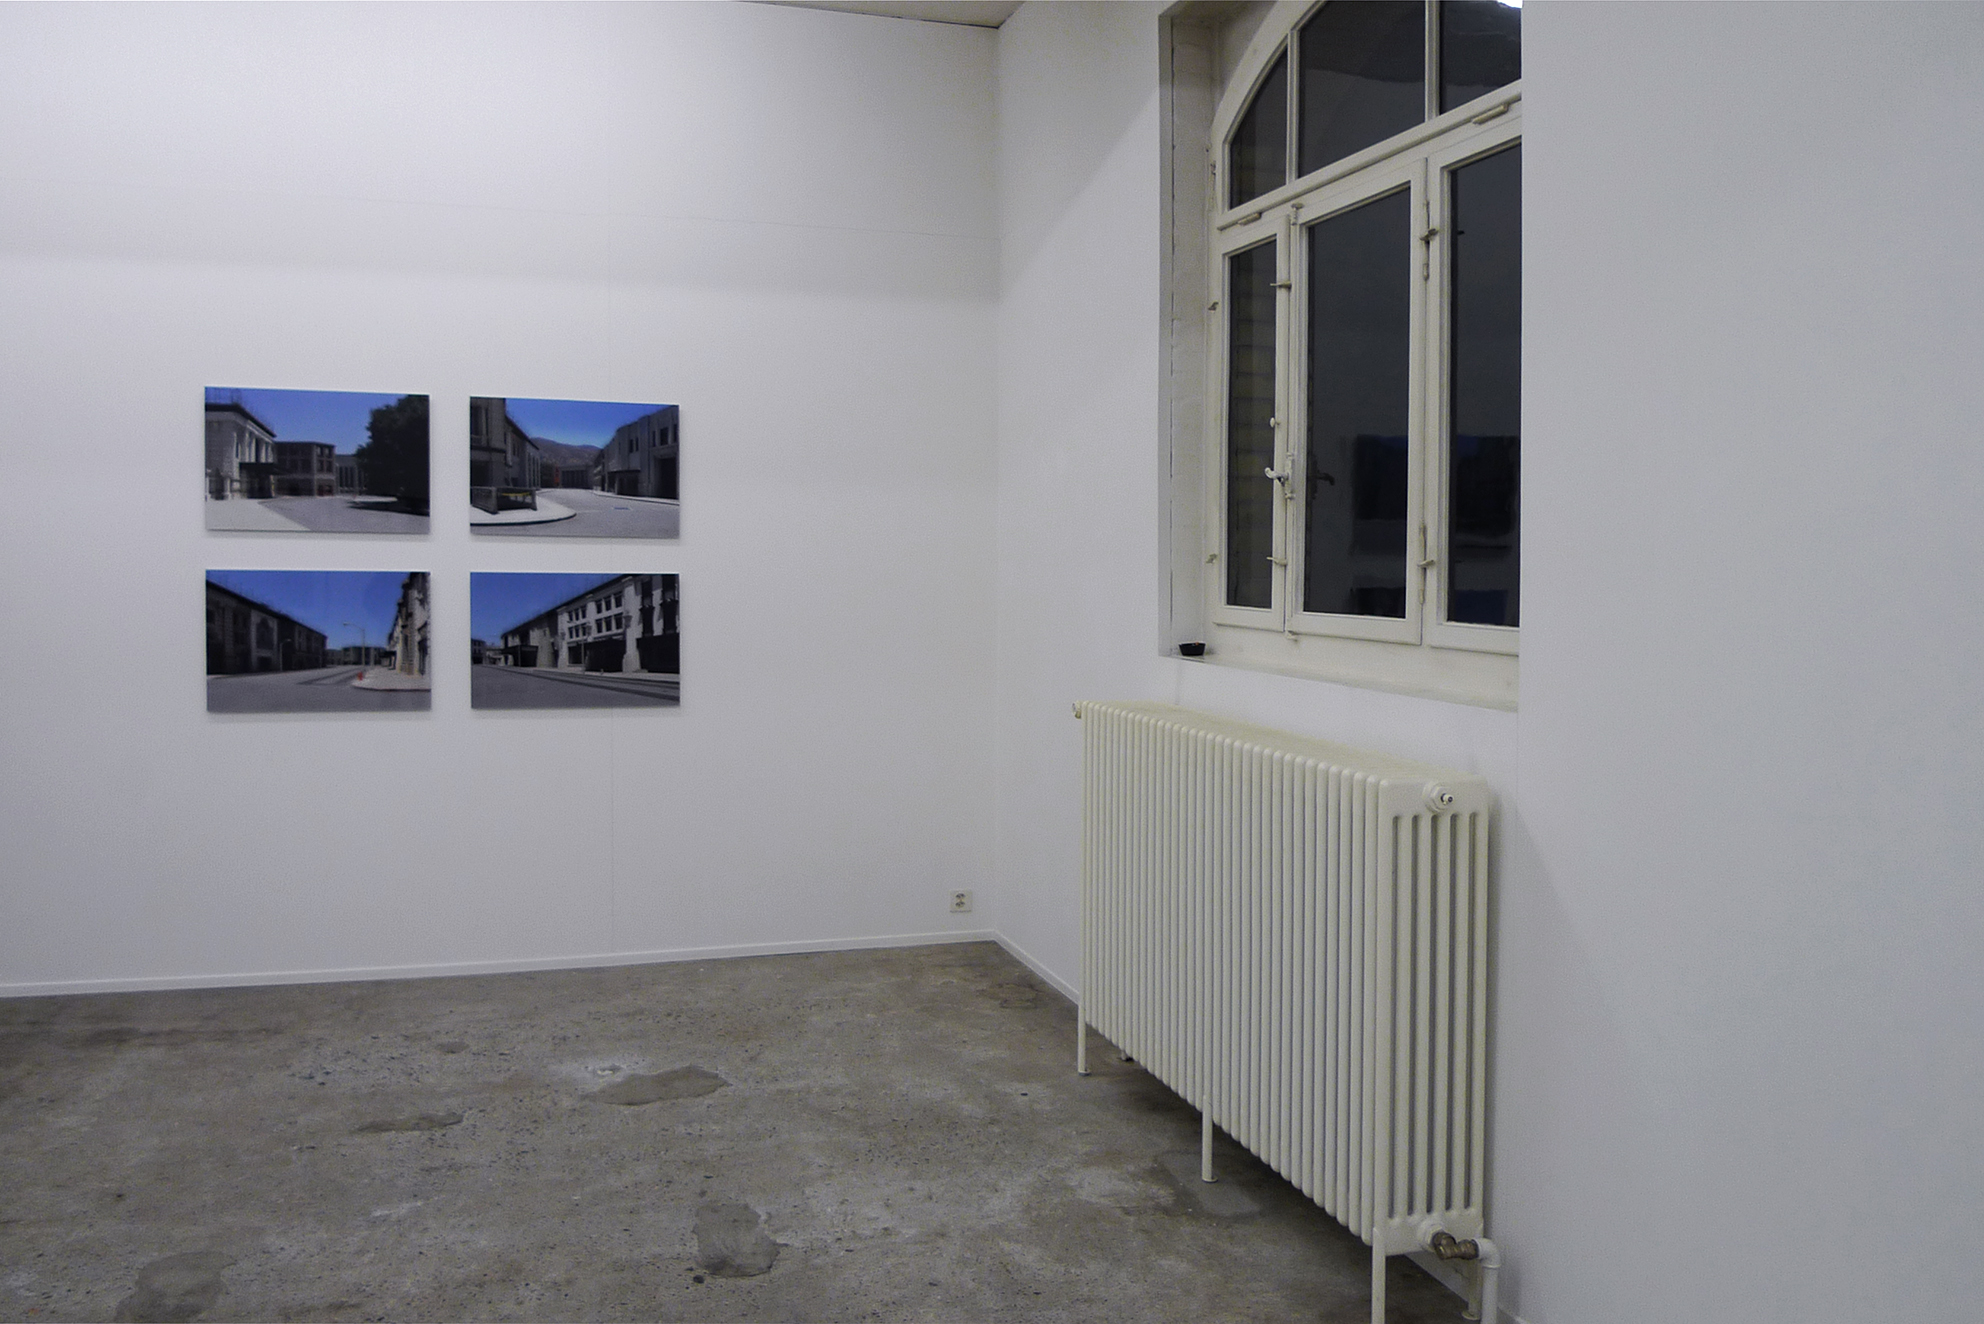 WB, Studio Warner Brothers, Los Angeles, series of 4 photographs, inkjet print / PVC and Plexiglas, 47 x 70 x 1 cm, 2010, with Swann Thommen